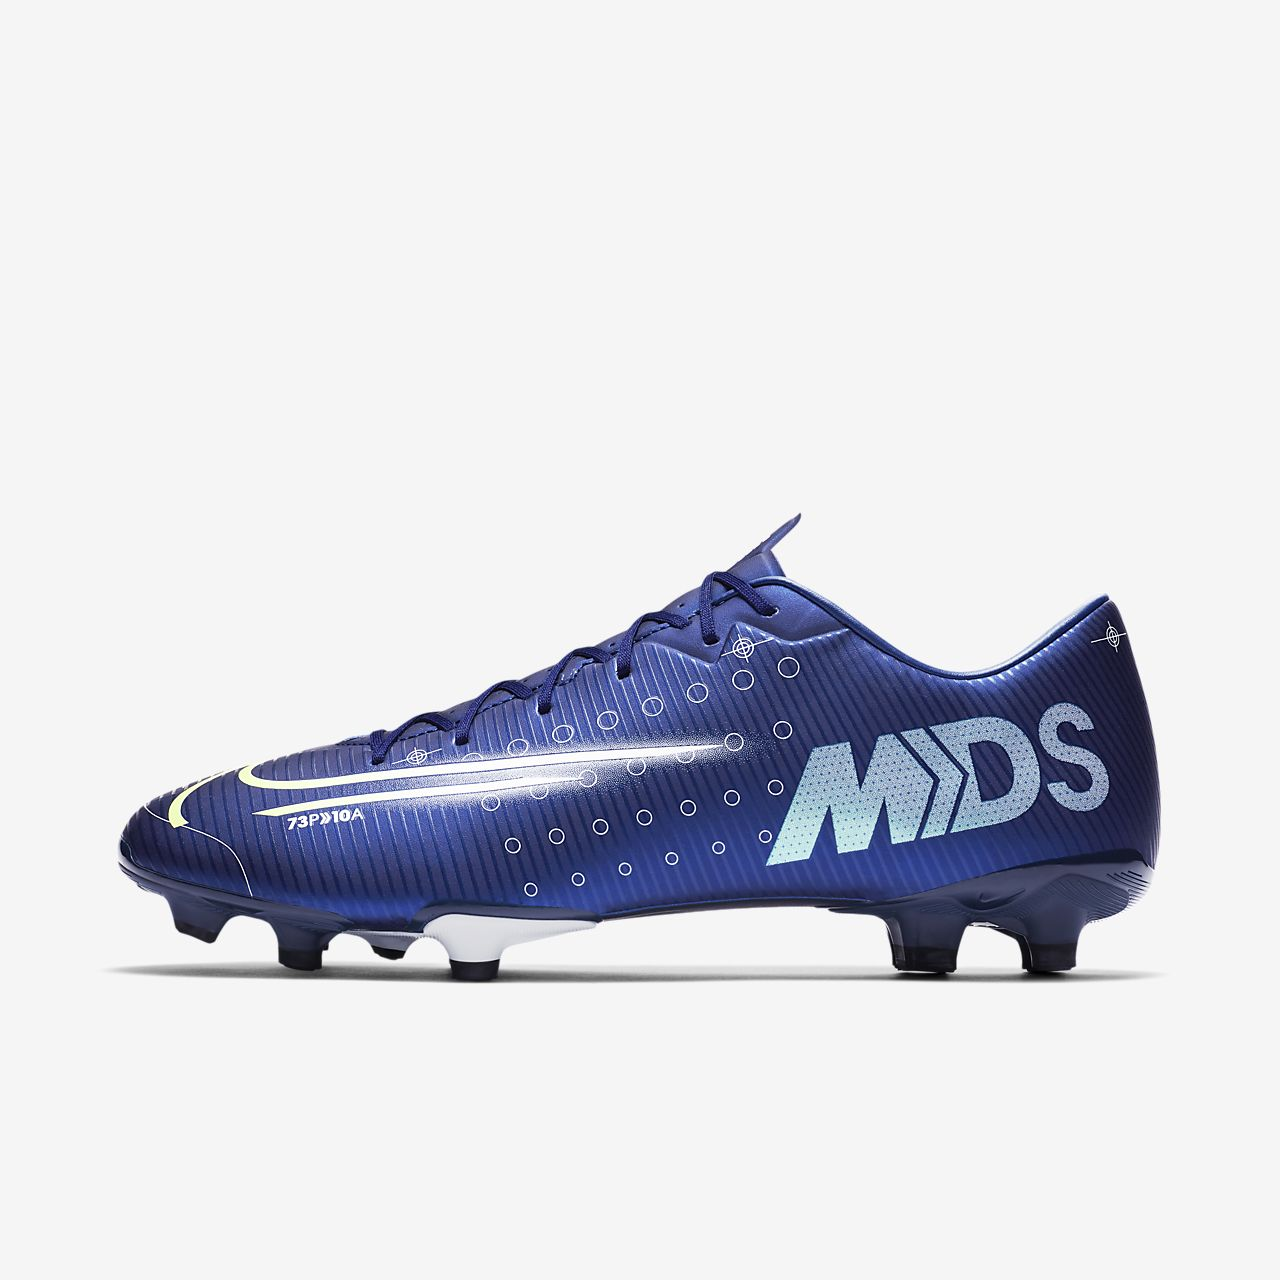 Nike Mercurial Vapor 13 Academy MDS MG Botas de fútbol para múltiples superficies